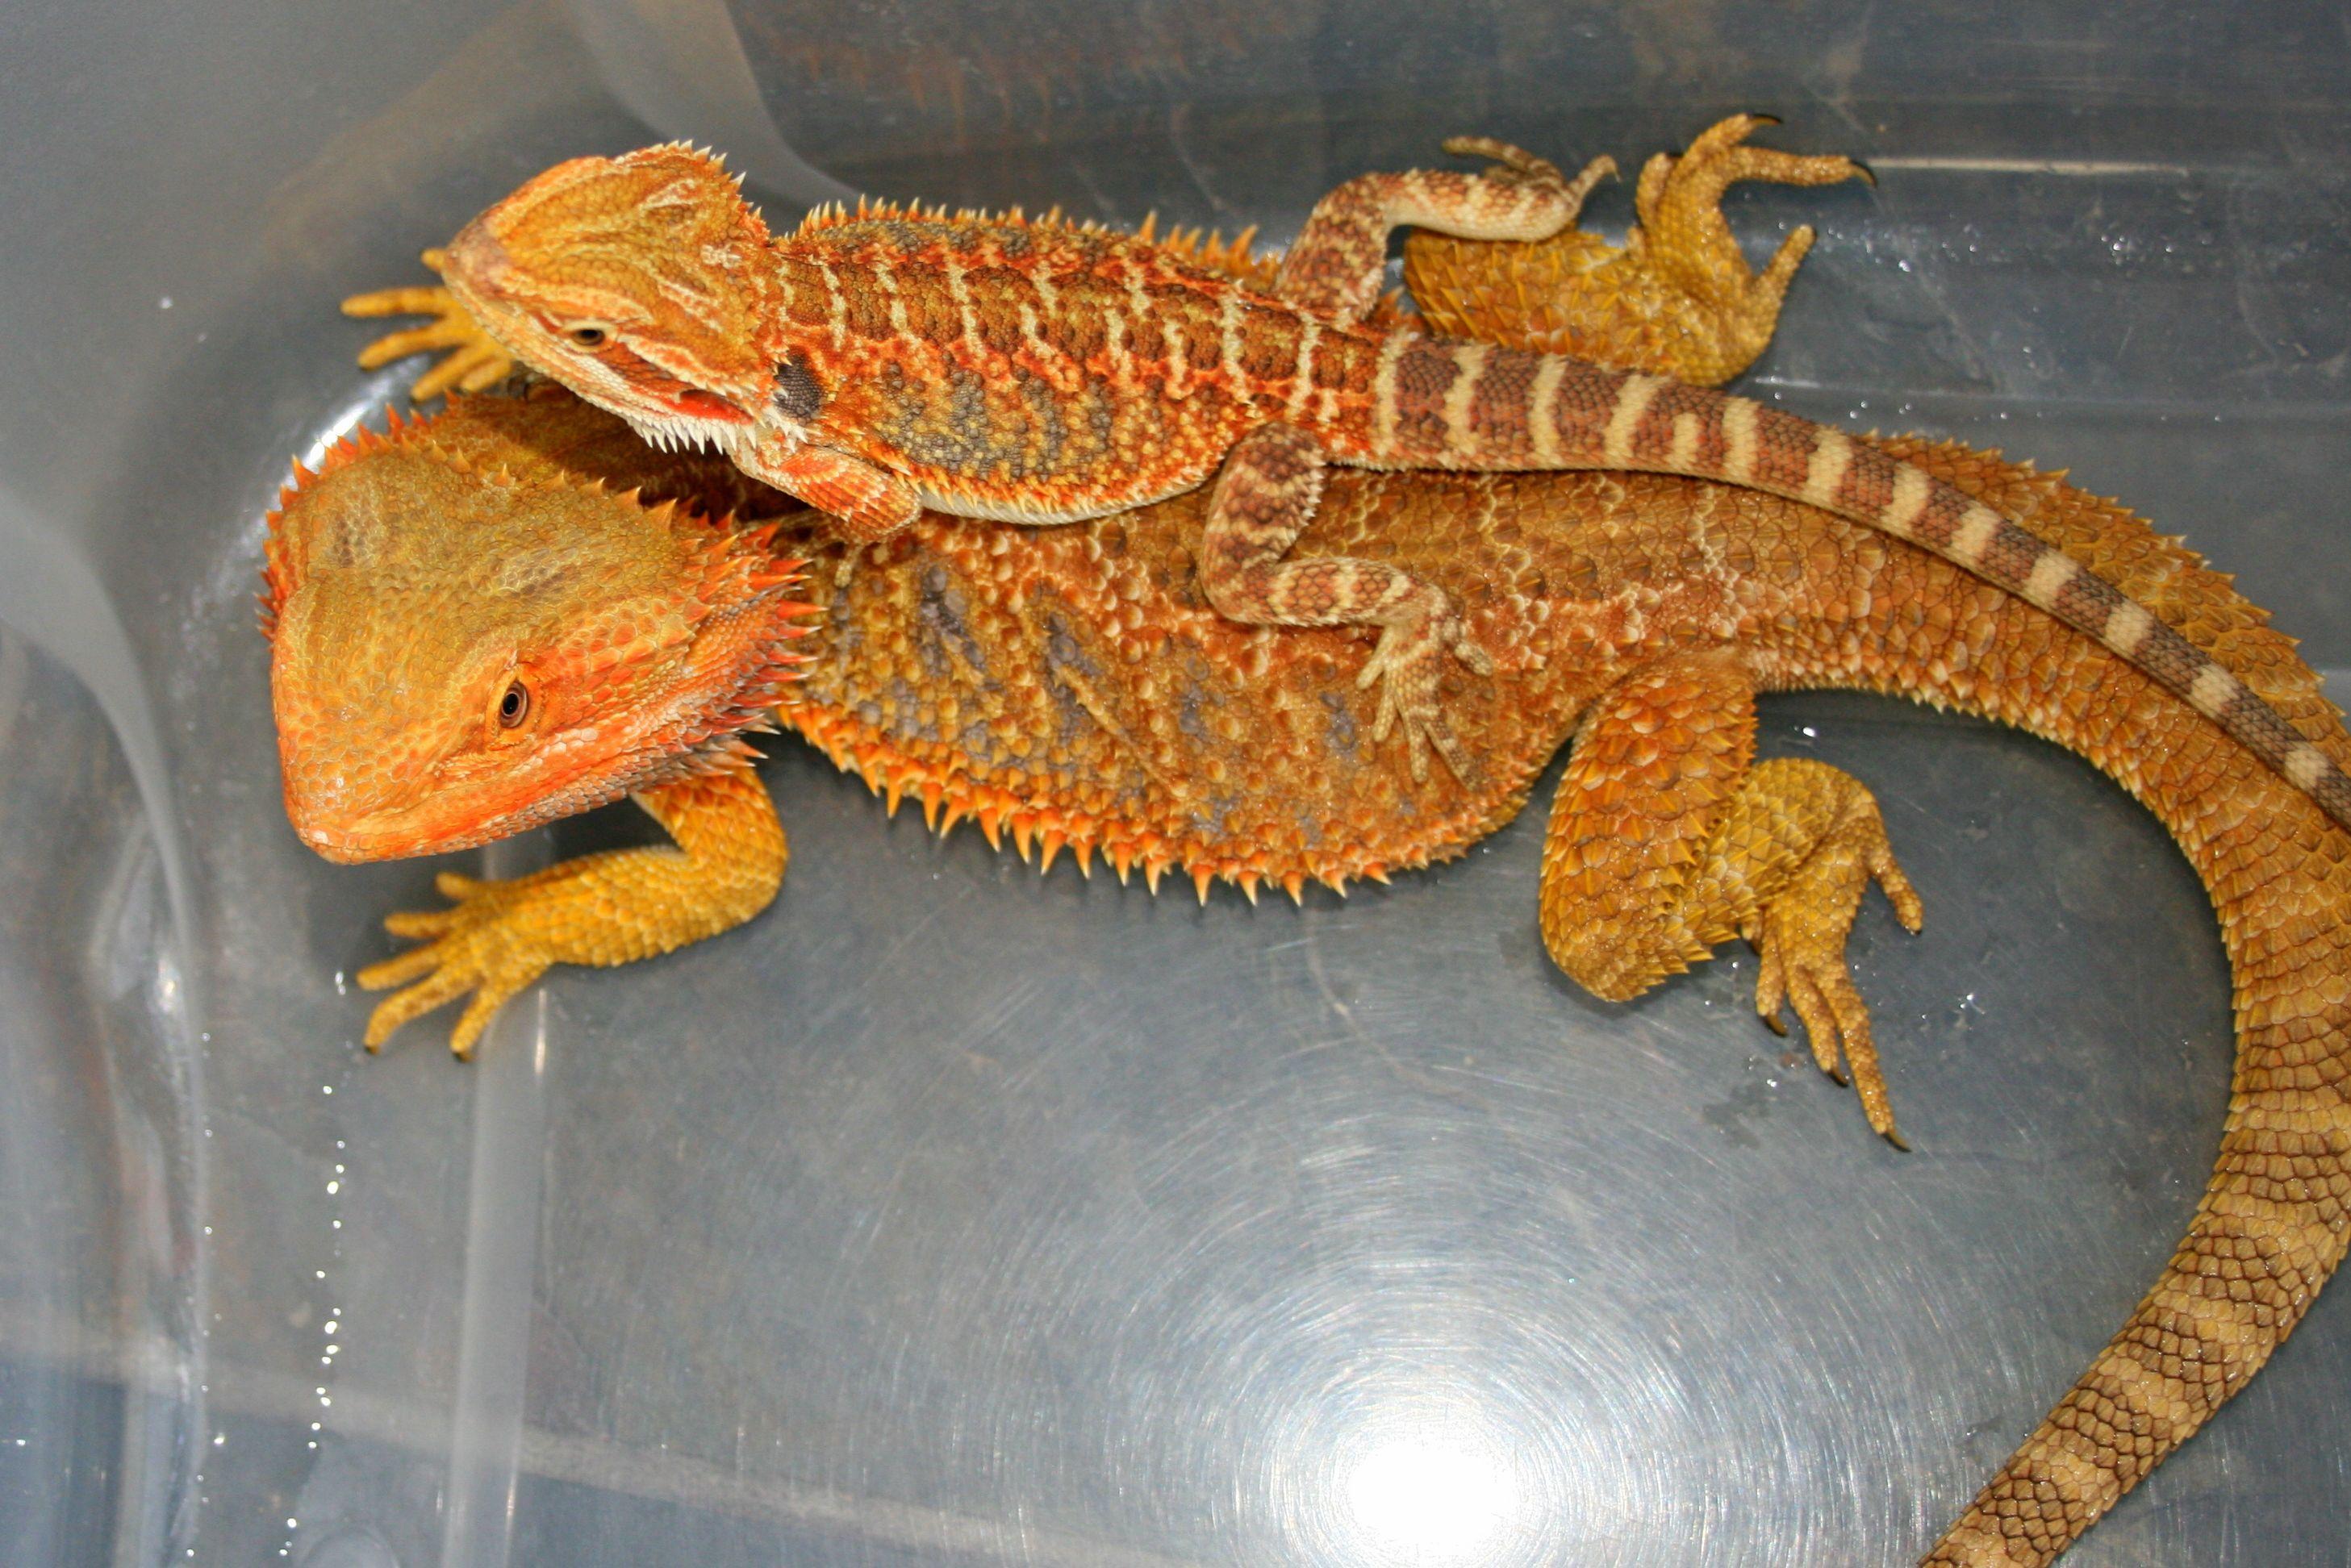 Bearded Dragon Wallpapers Free Wallpaper Download Bearded Dragon Bearded Dragon Food Baby Bearded Dragon